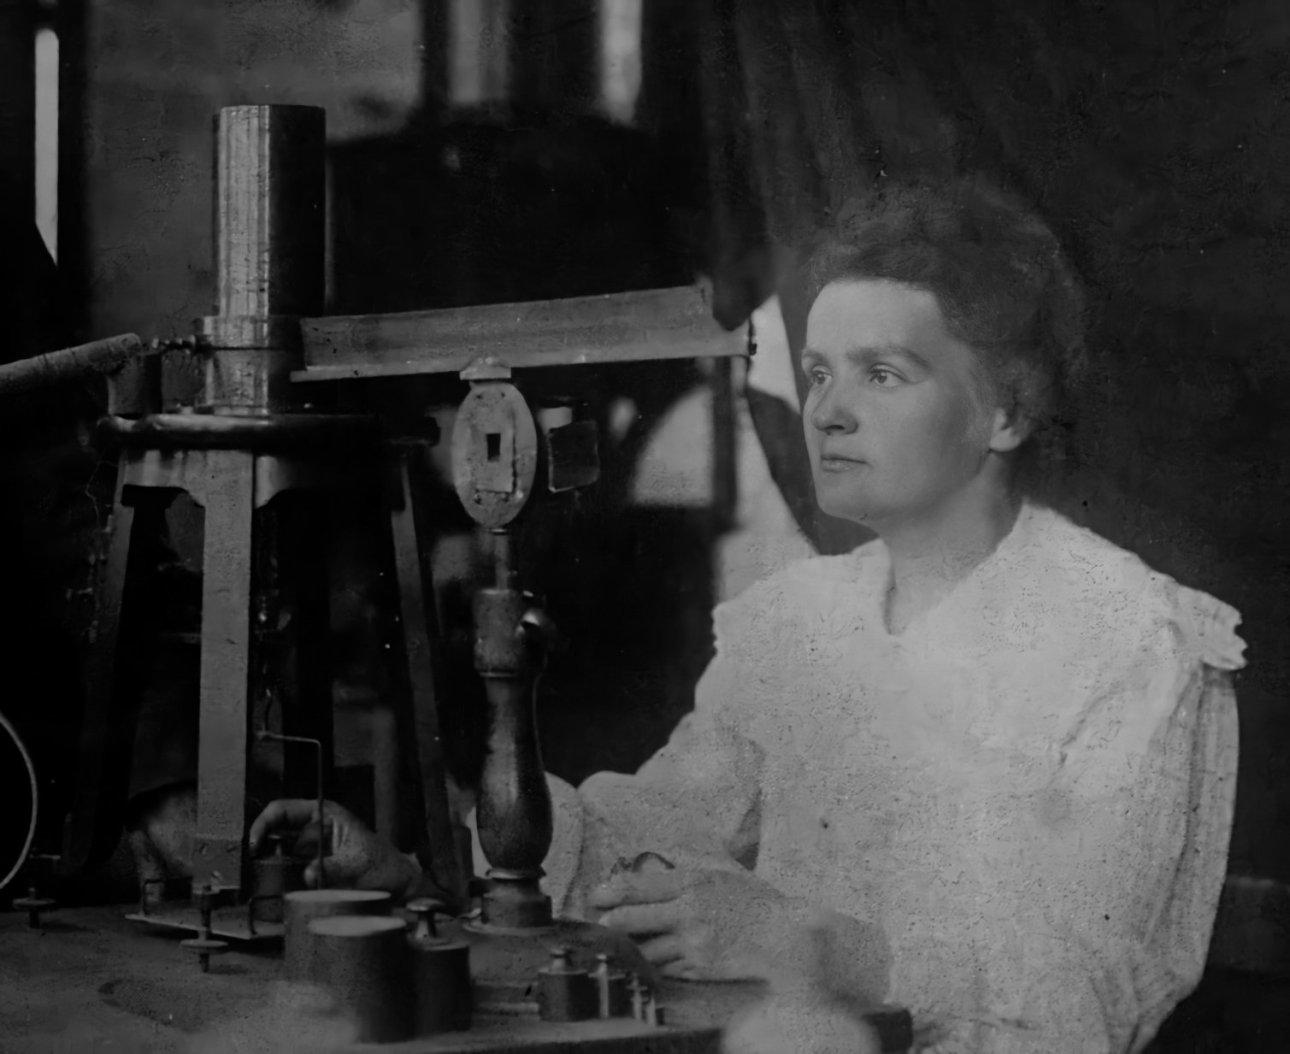 Marie Curie physicist chemist